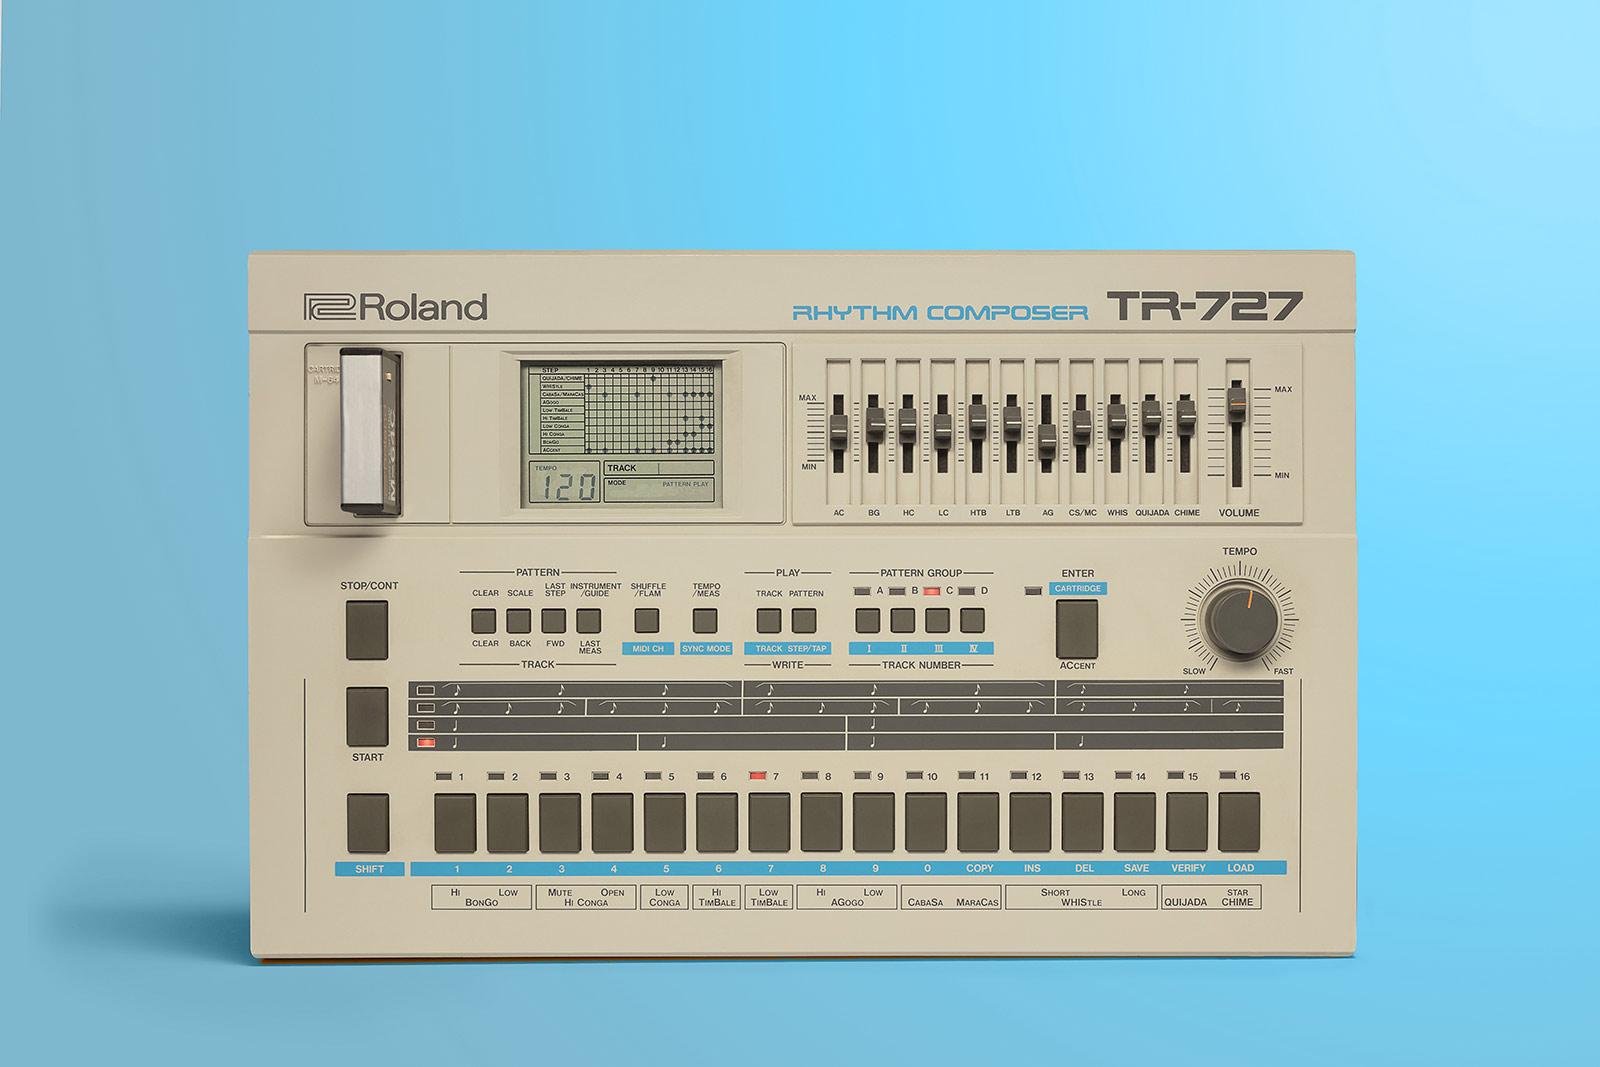 TR-727 Rhythm Composer